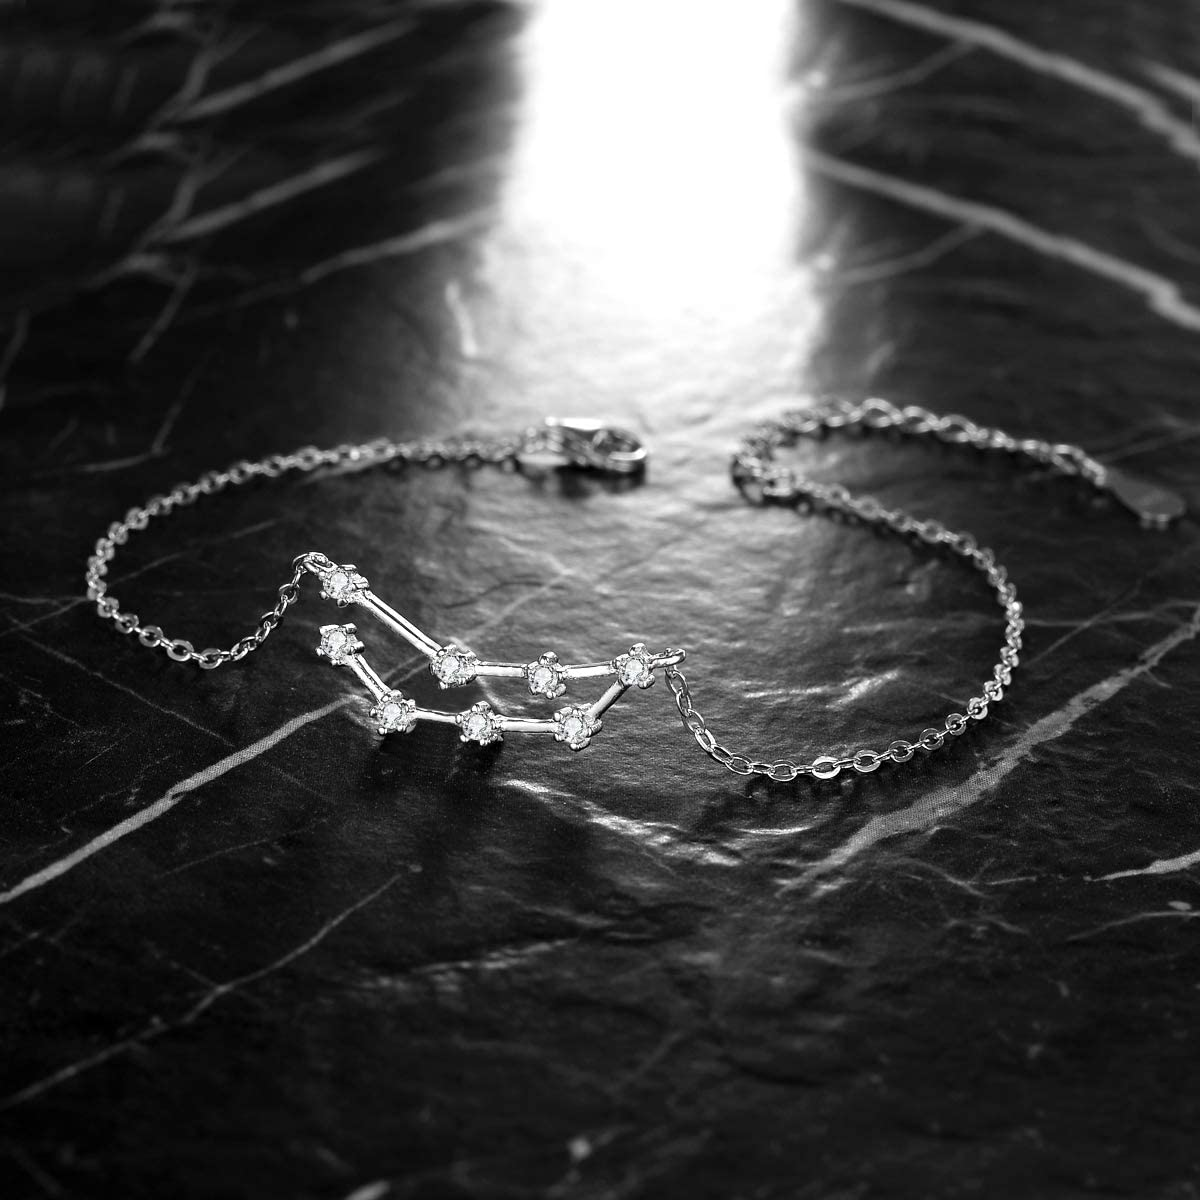 Clearine Femme Bracelet 12 Constellations Signes du Zodiaque 925 Argent Zircon Strass Signifiatif Parure Bijoux Horoscope Astrologie